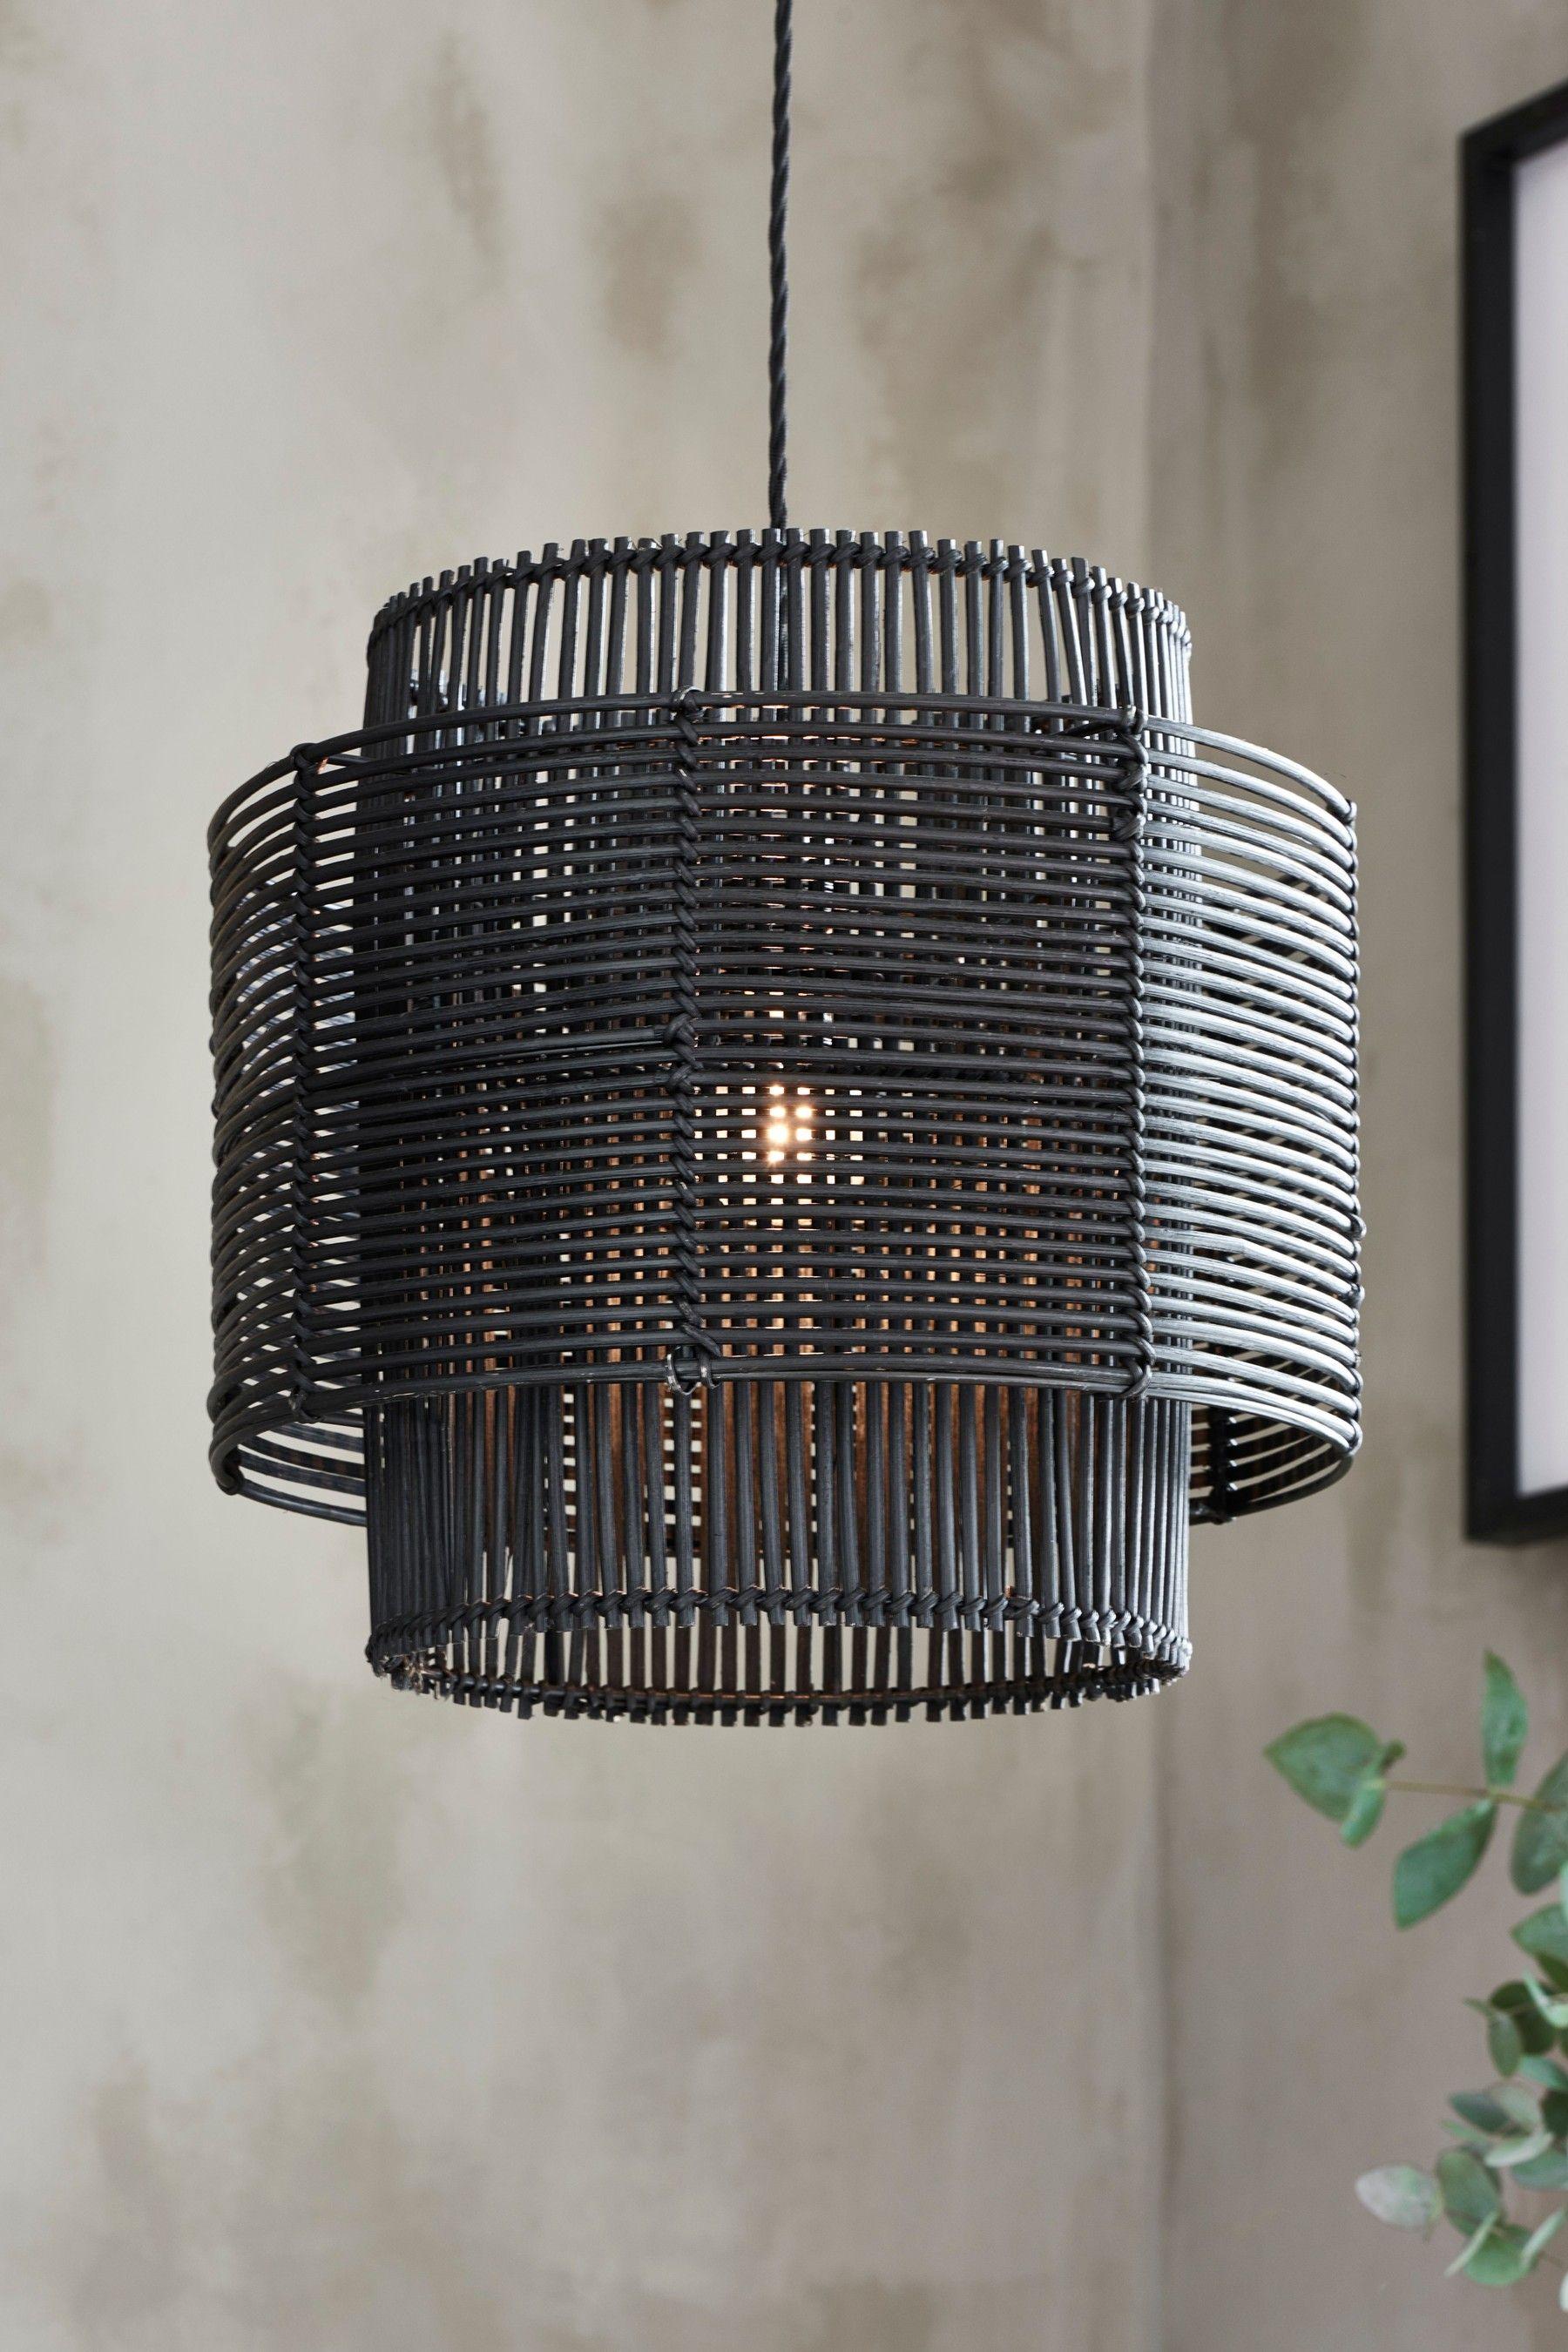 Kai Rattan Easy Fit Shade In 2020 Black Hanging Lighting Rattan Lamp Rattan Shades